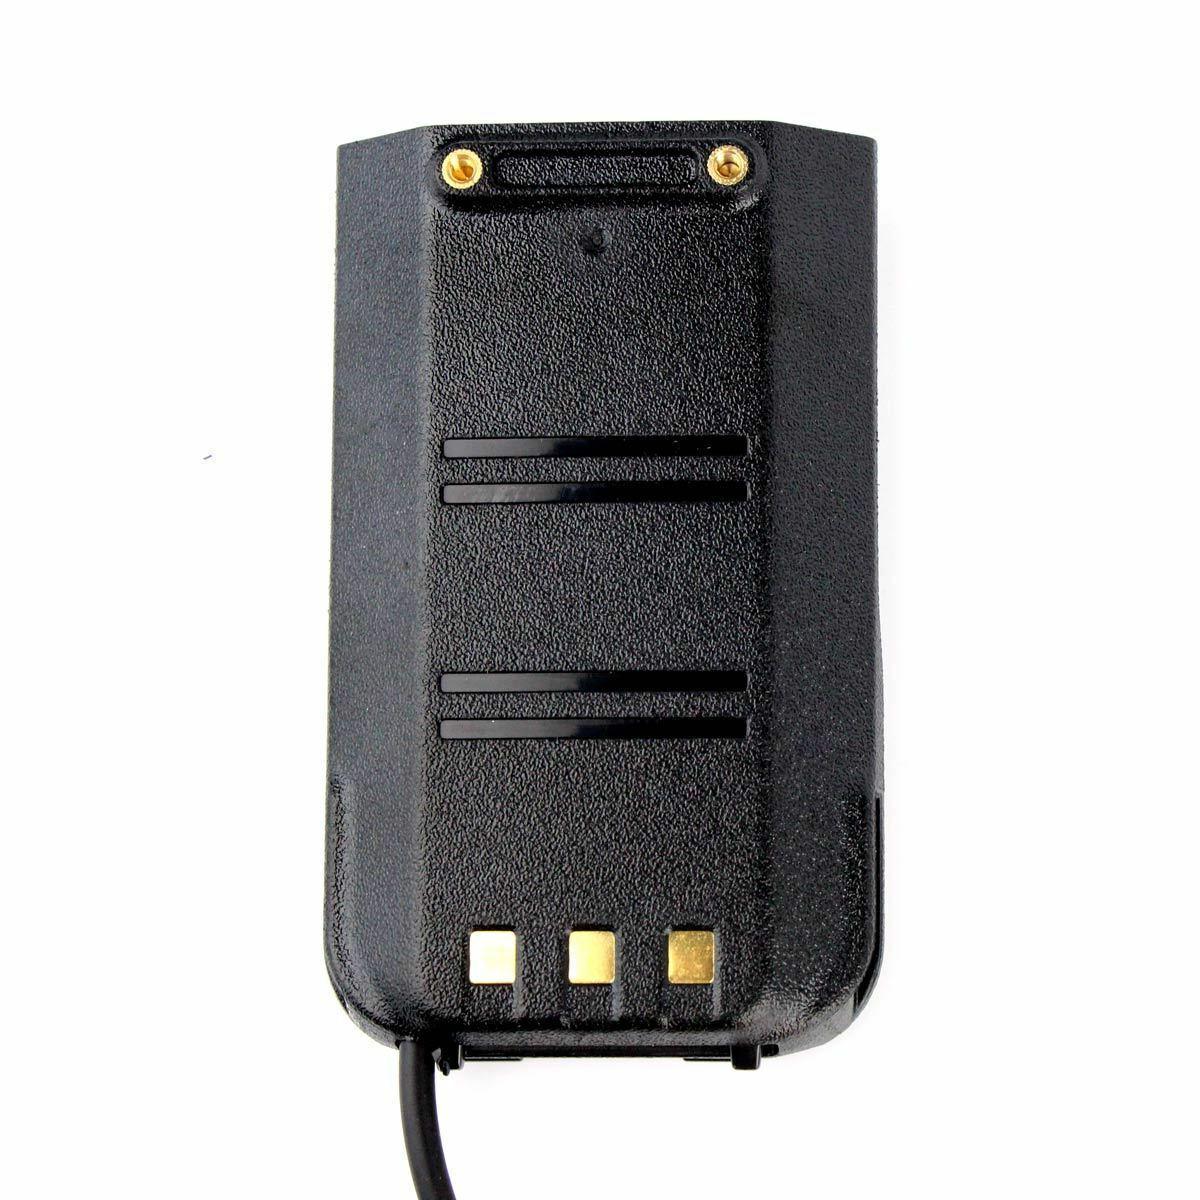 Car Charger Battery Eliminator for MD-380 US